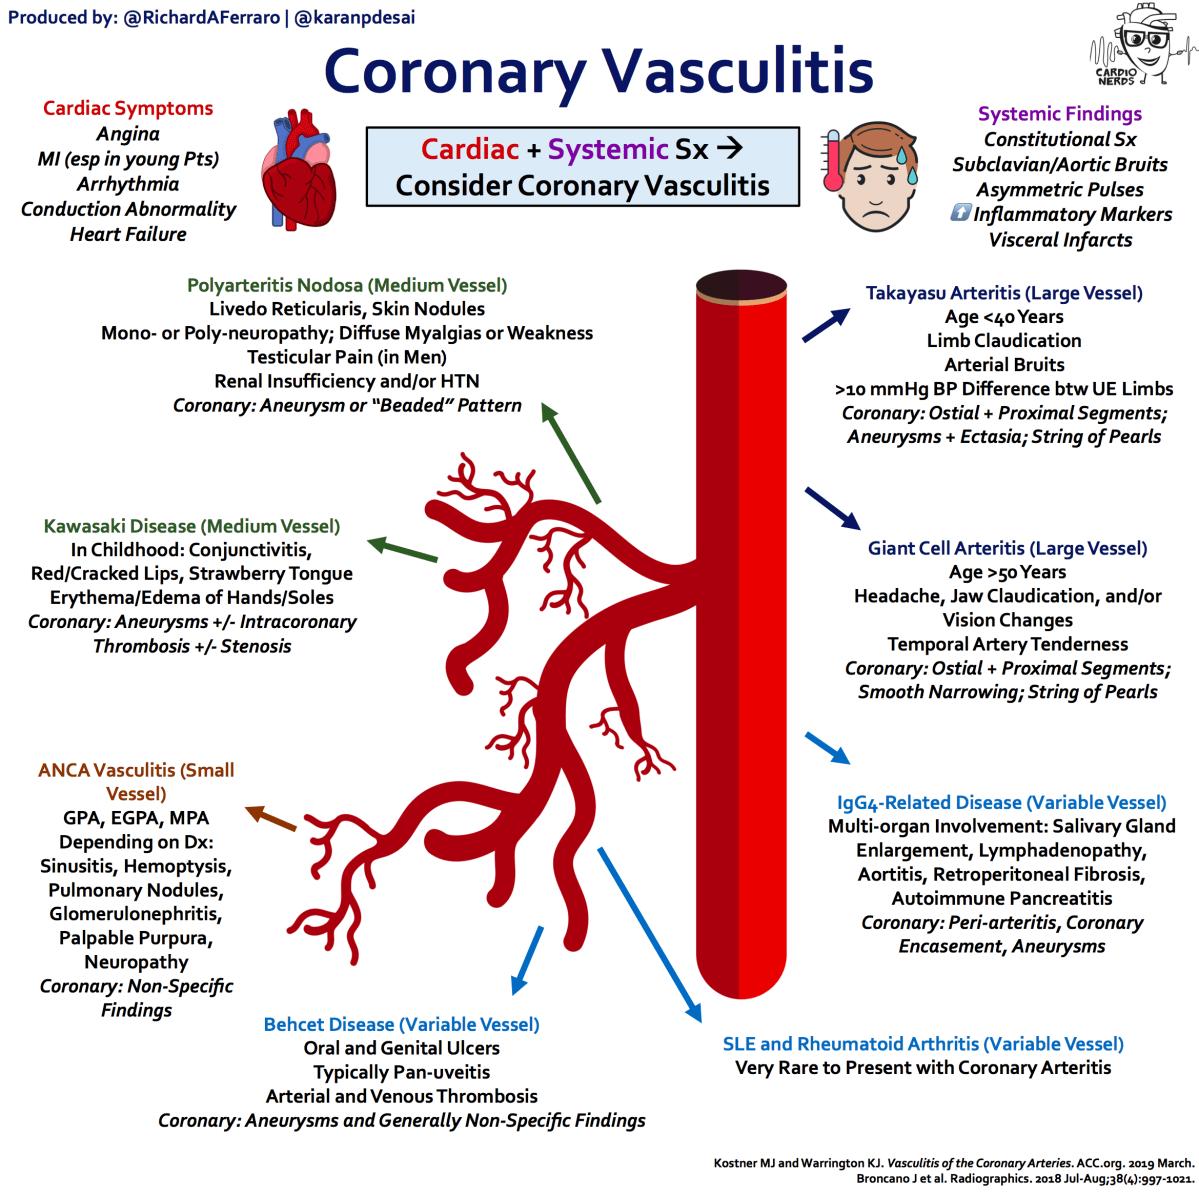 Coronary Vasculitis